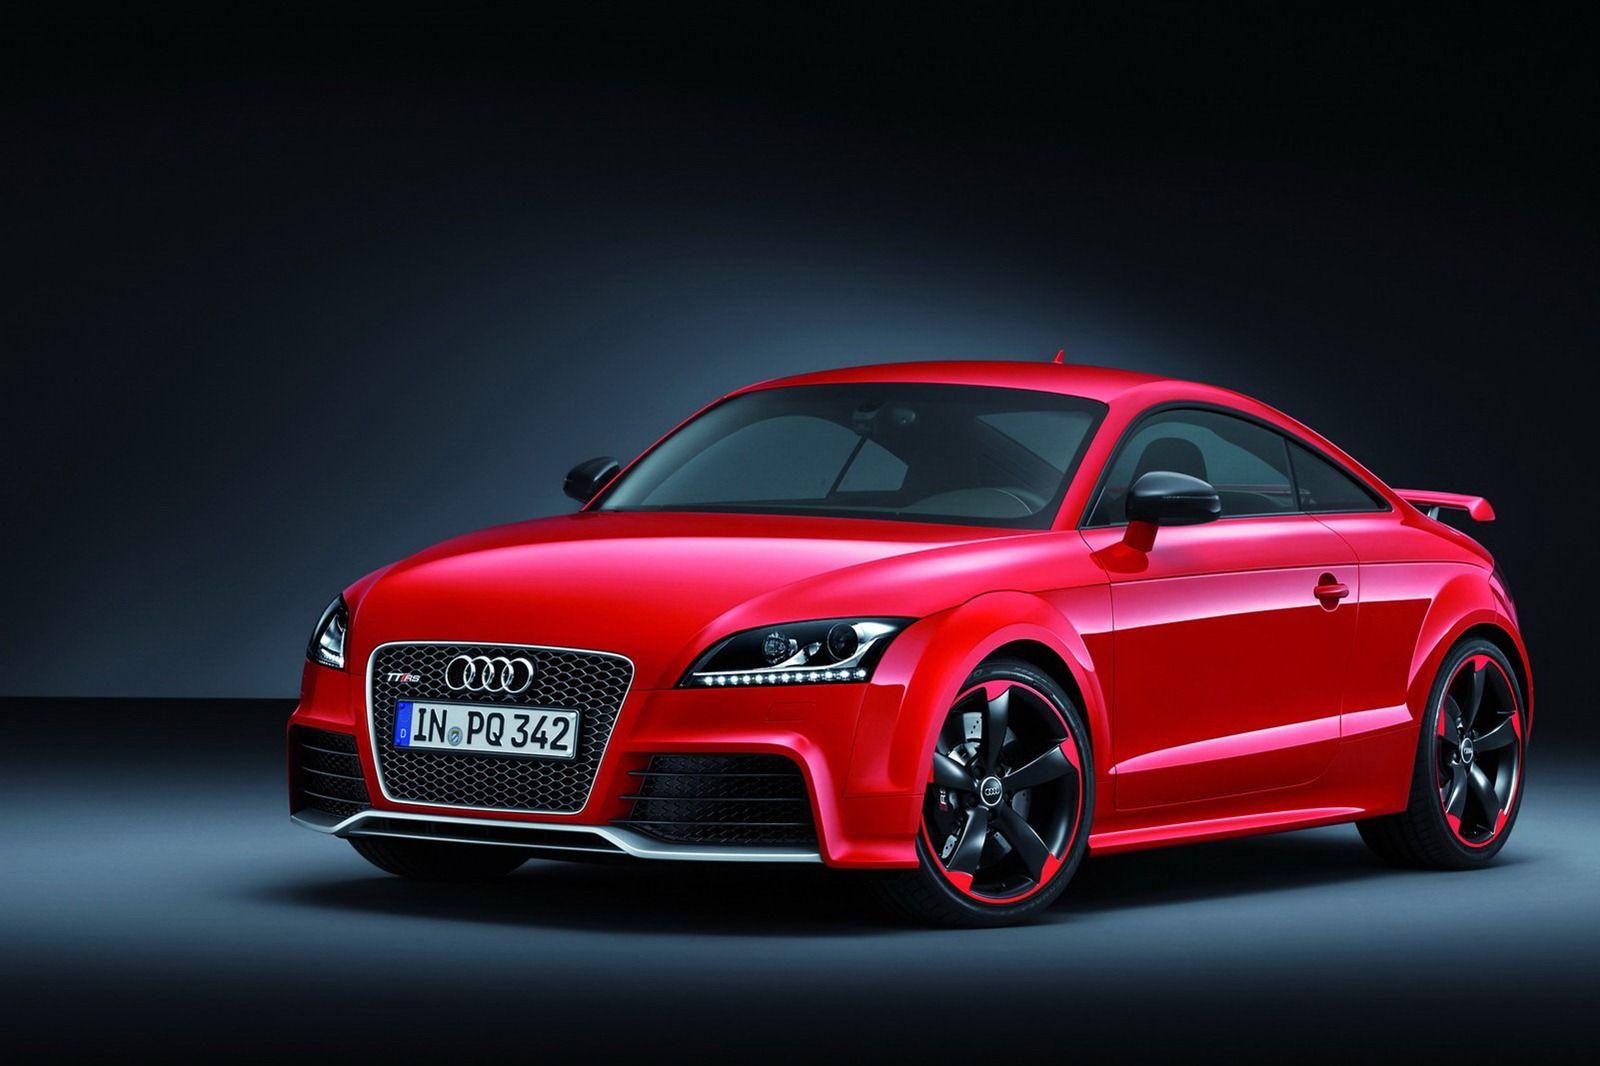 Audi Unveils The New Tt Rs Plus Audi Tt Rs Audi Tt Audi Cars